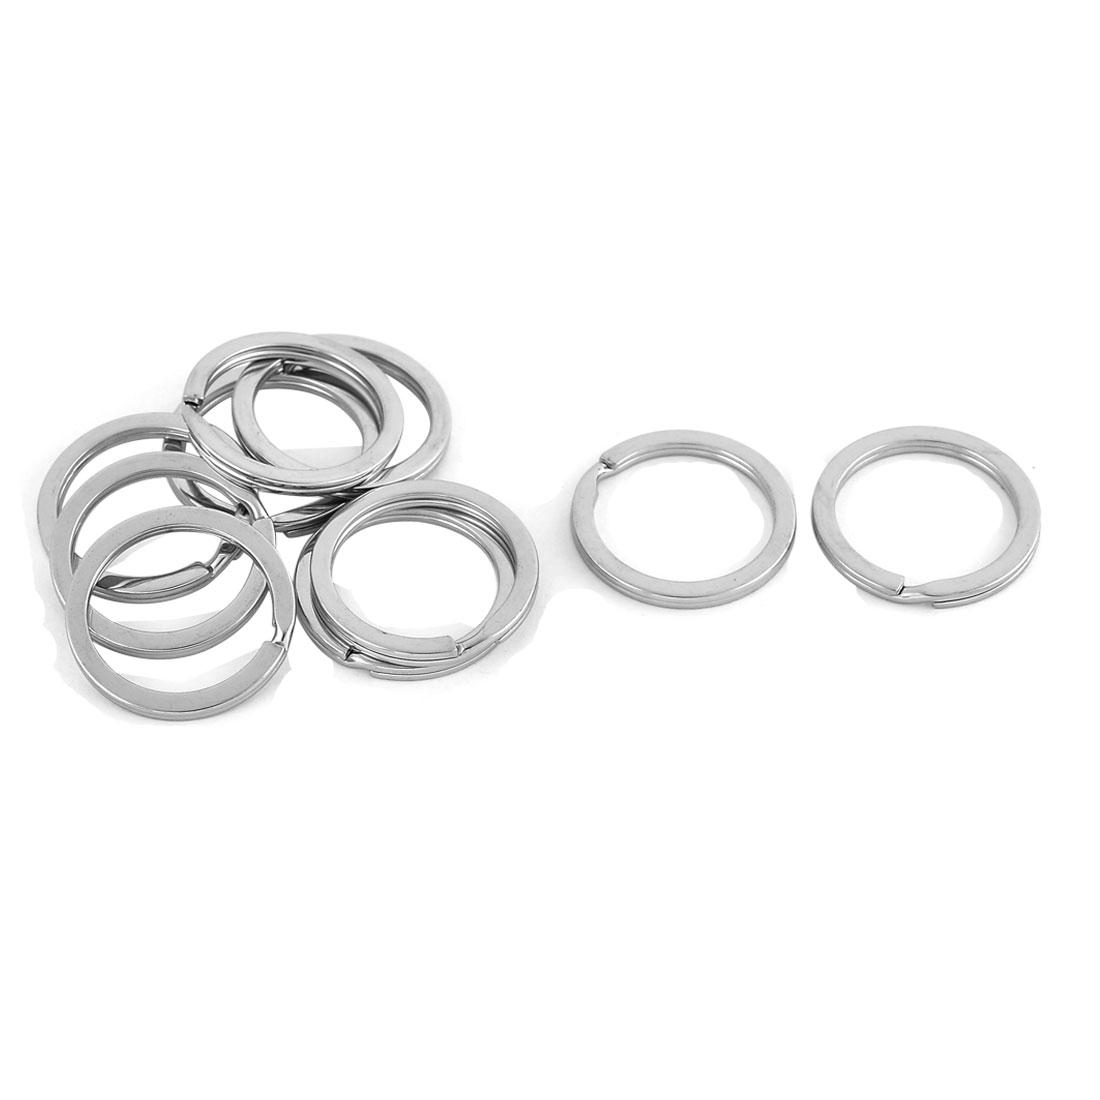 Metal Glossy Double Loop Split Ring Keyring Silver Tone 2.5cm Diameter 10 Pcs